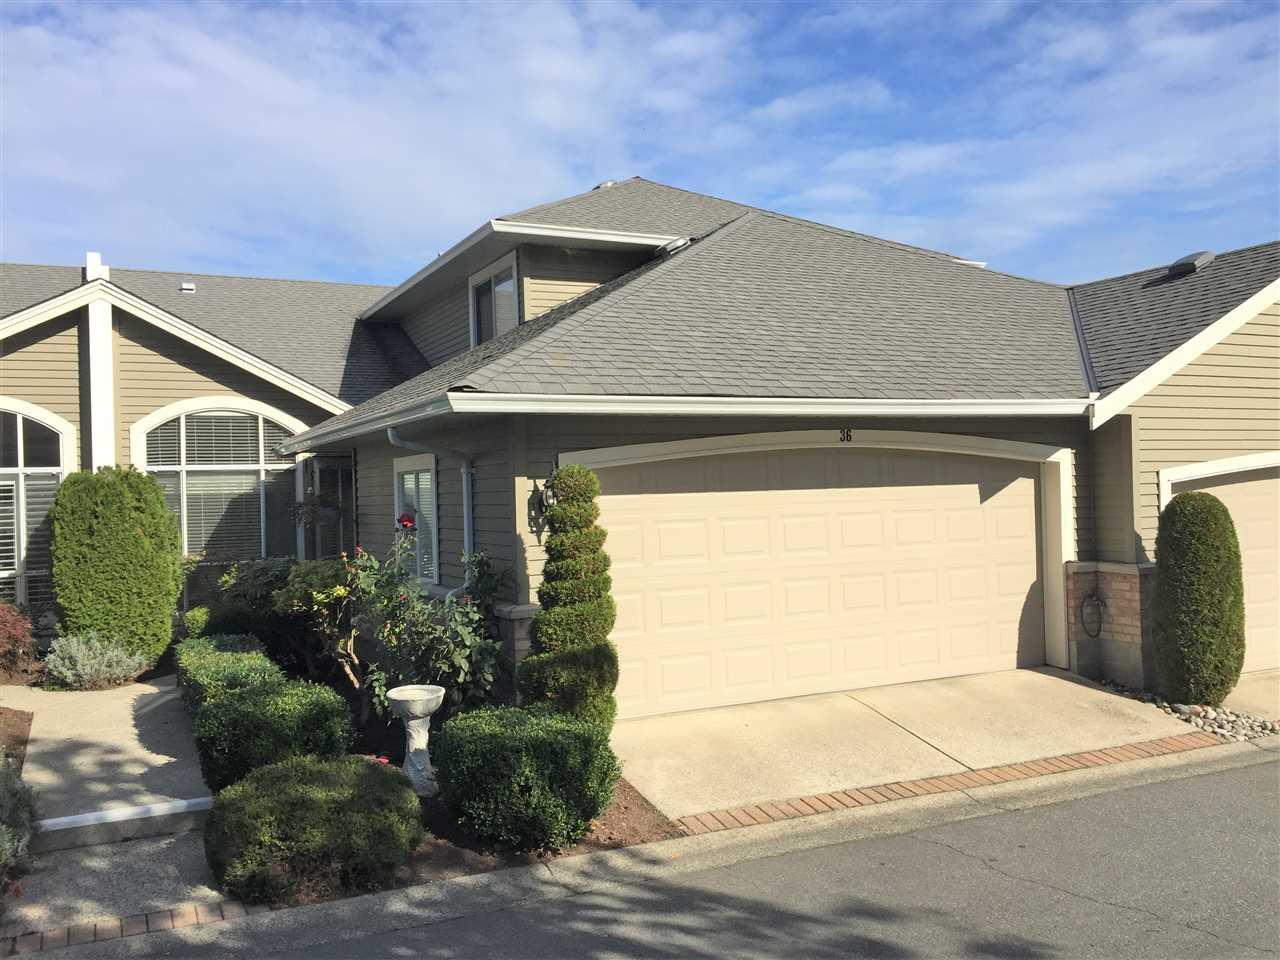 Buliding: 2672 151 Street, Surrey, BC